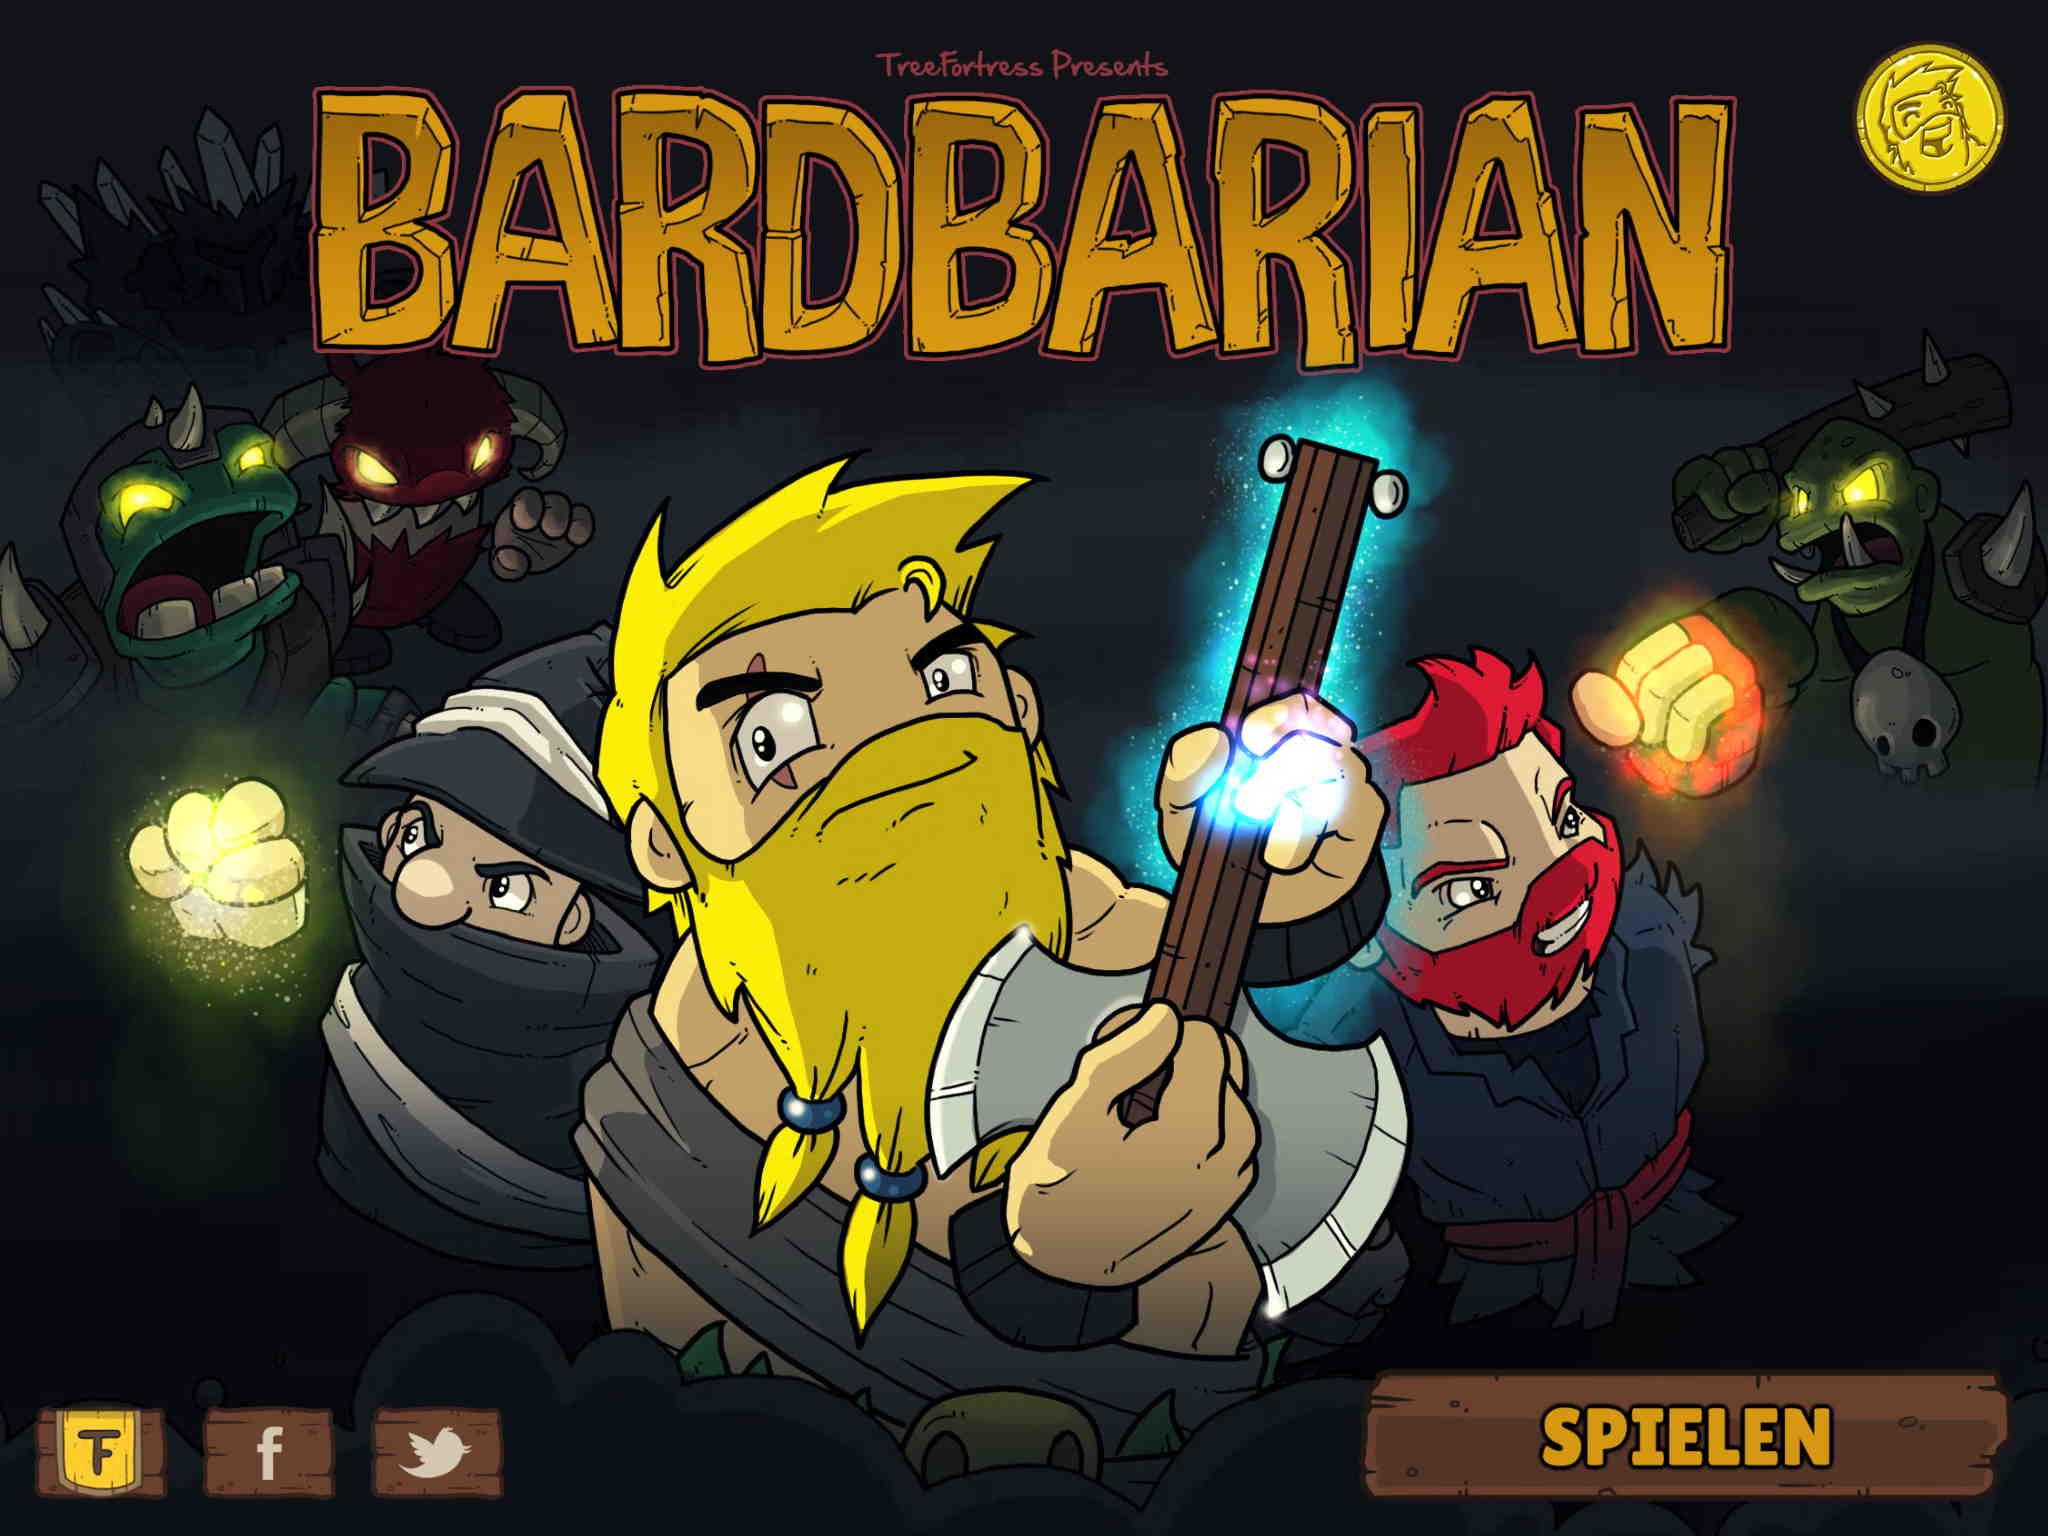 Bardbarian_01